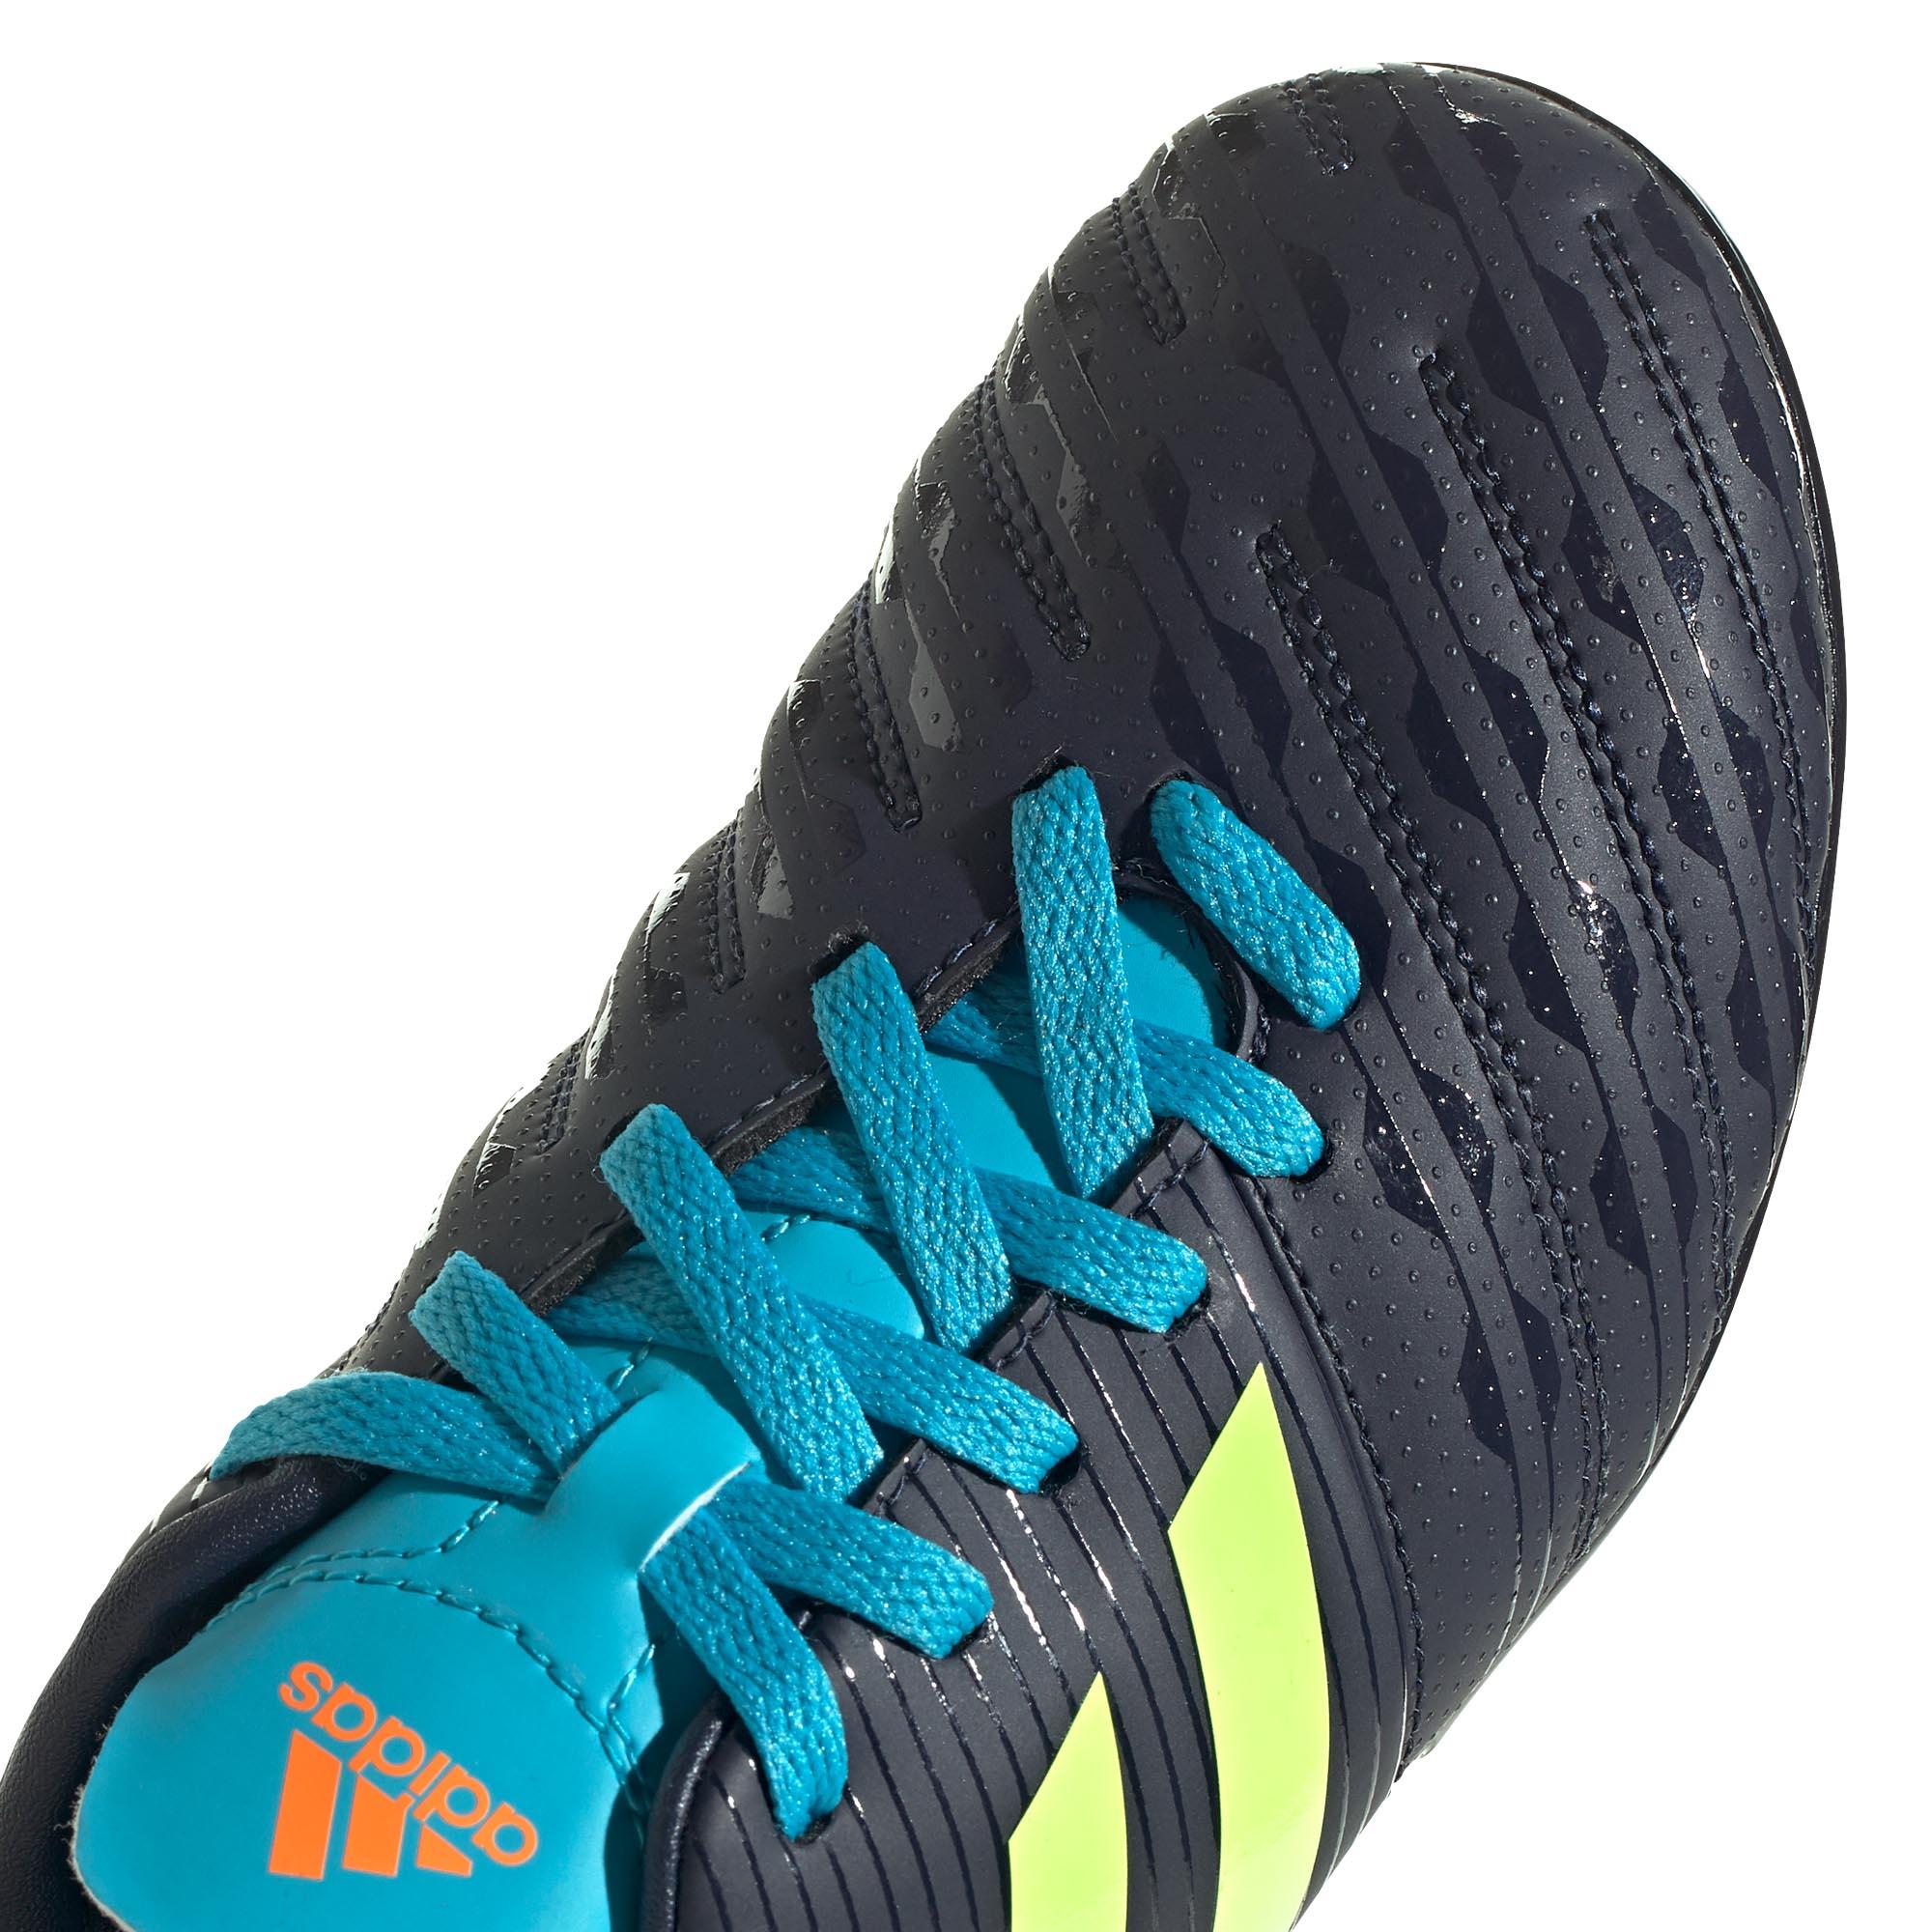 miniature 9 - Adidas Malice SG Terrain Souple Junior Enfants Rugby Bottes Bleu Marine/Vert